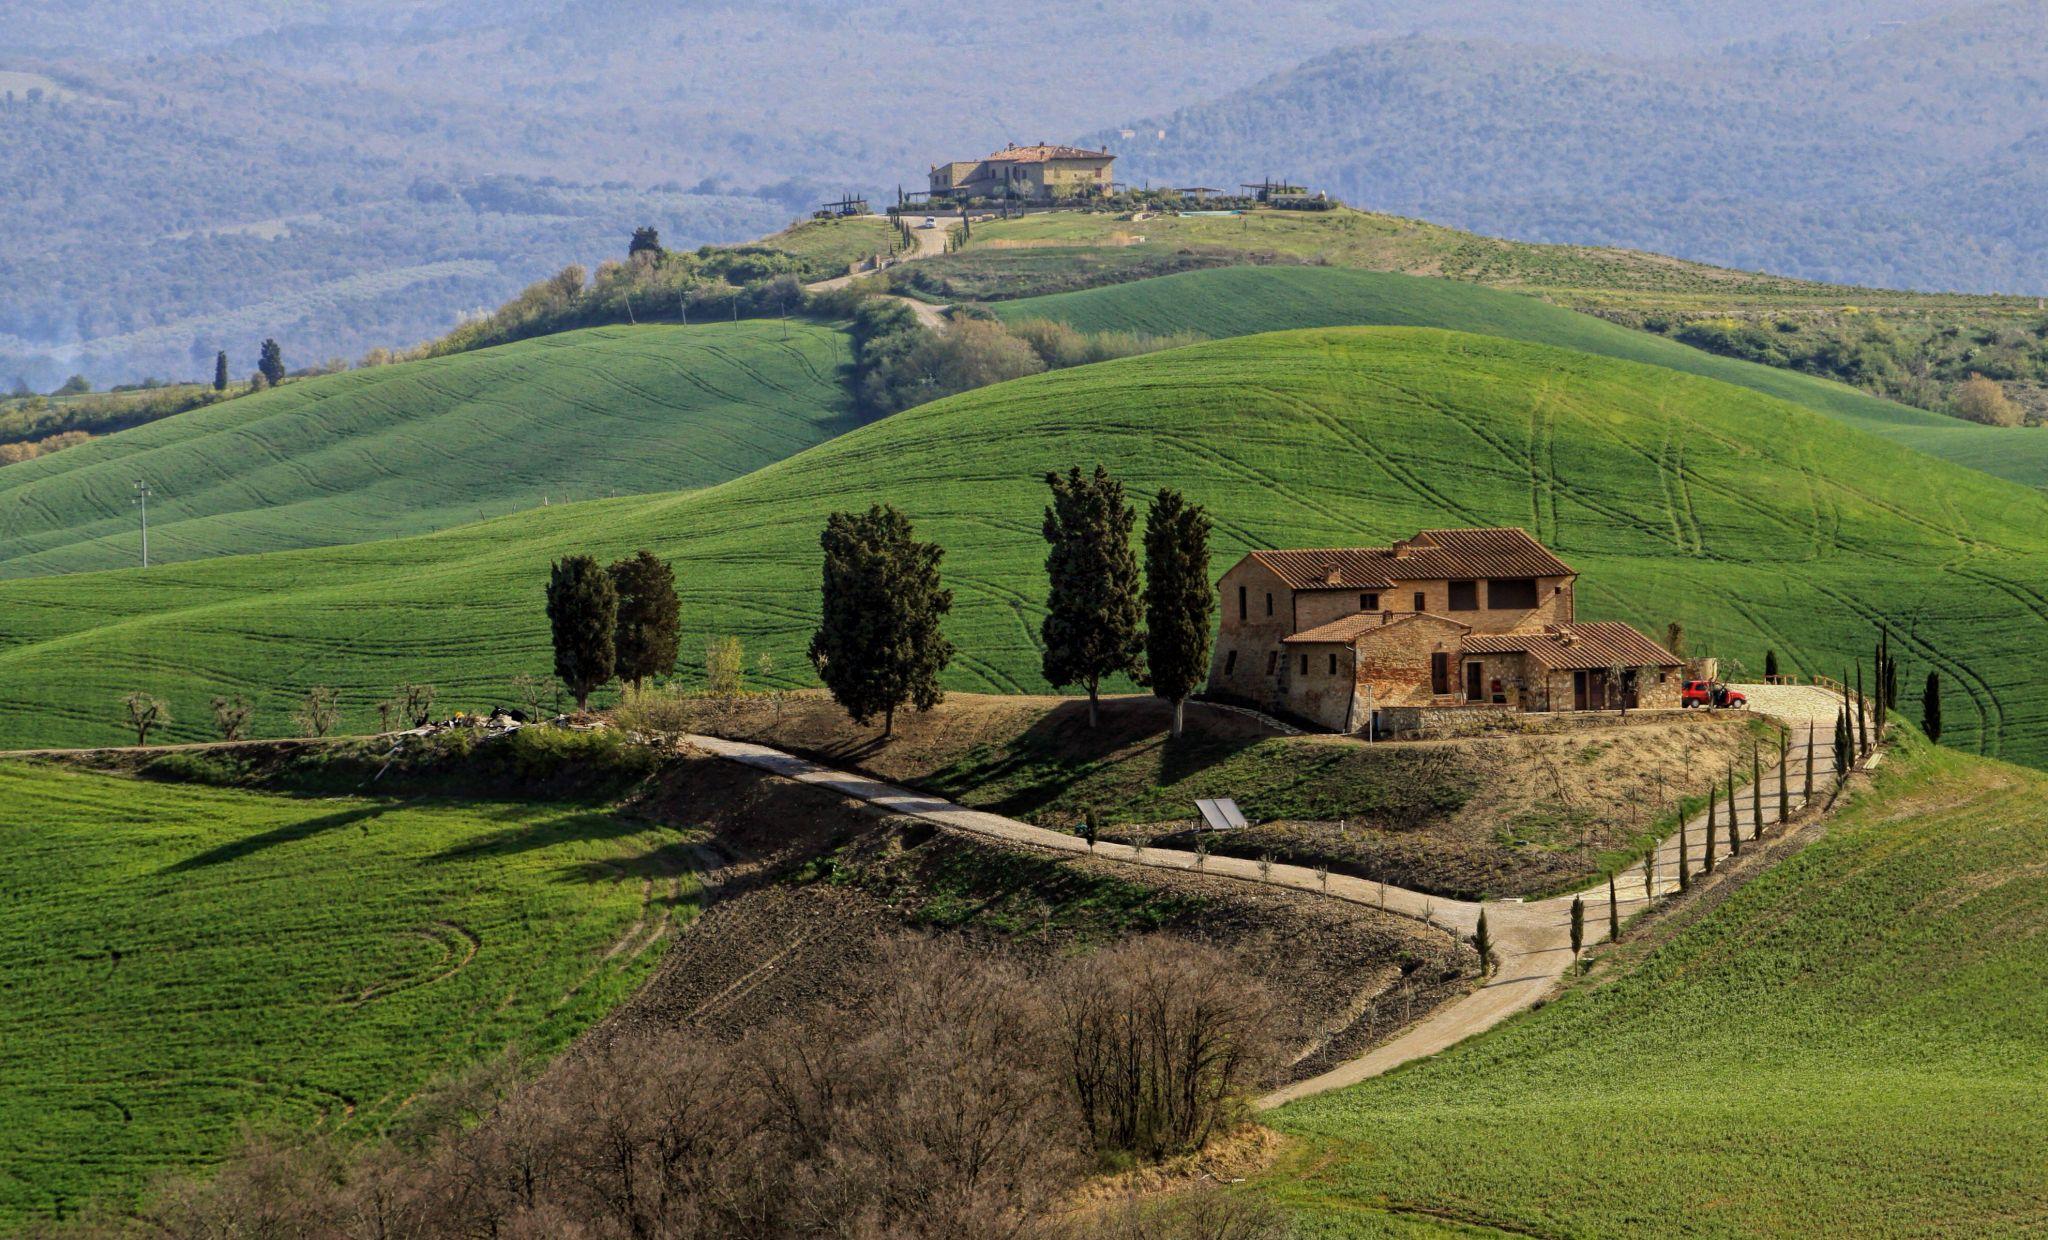 Crete Senesi, Italy